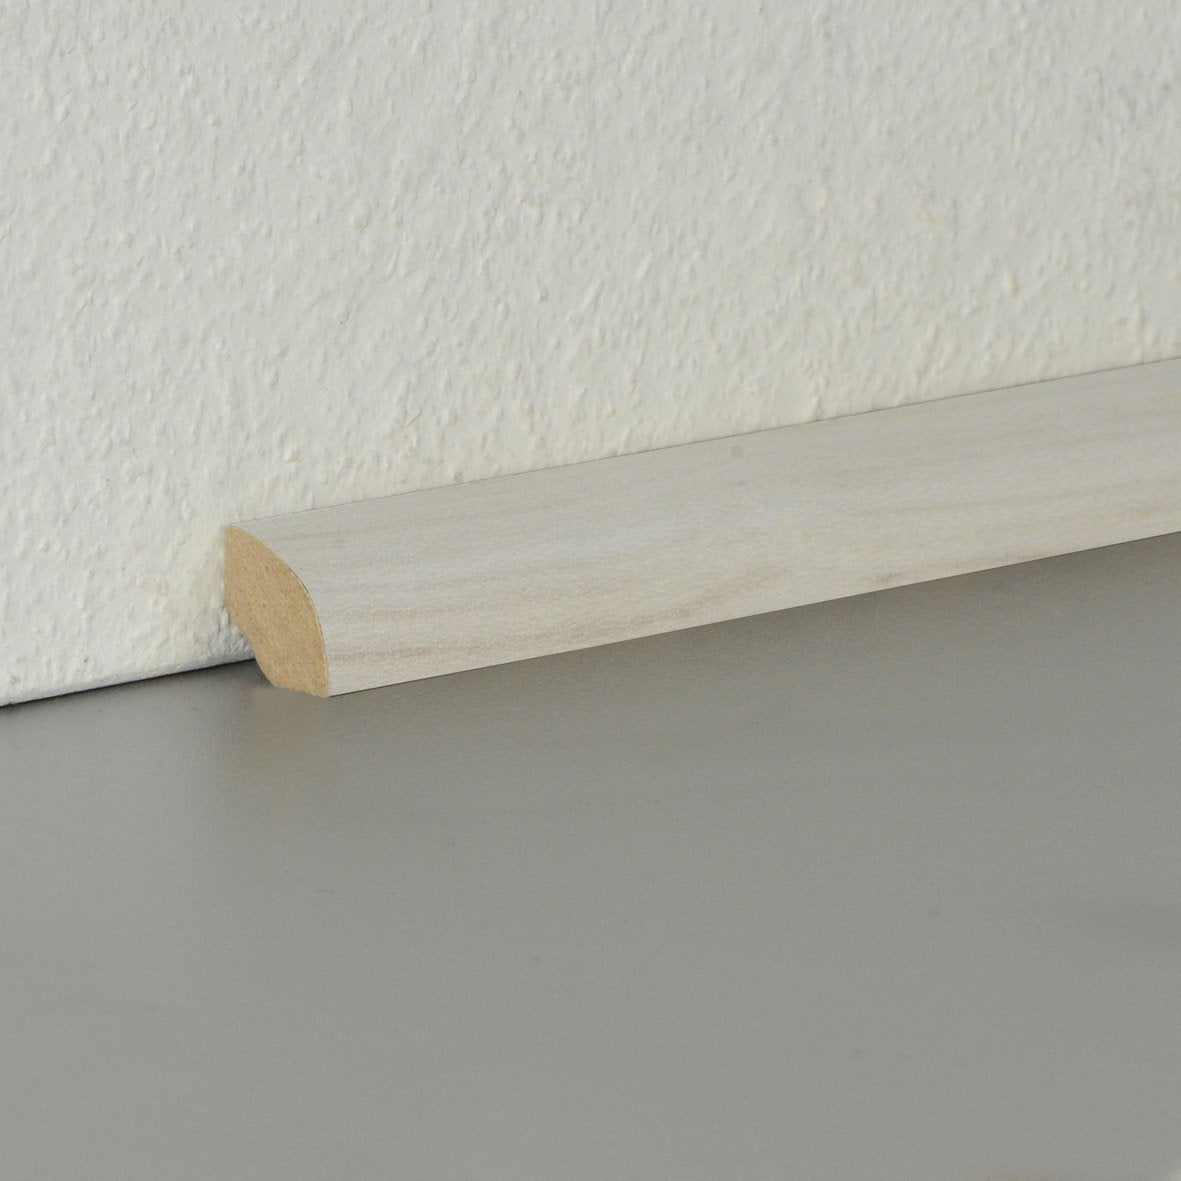 quart de rond sol stratifi d cor n 370 cm x x mm leroy merlin. Black Bedroom Furniture Sets. Home Design Ideas